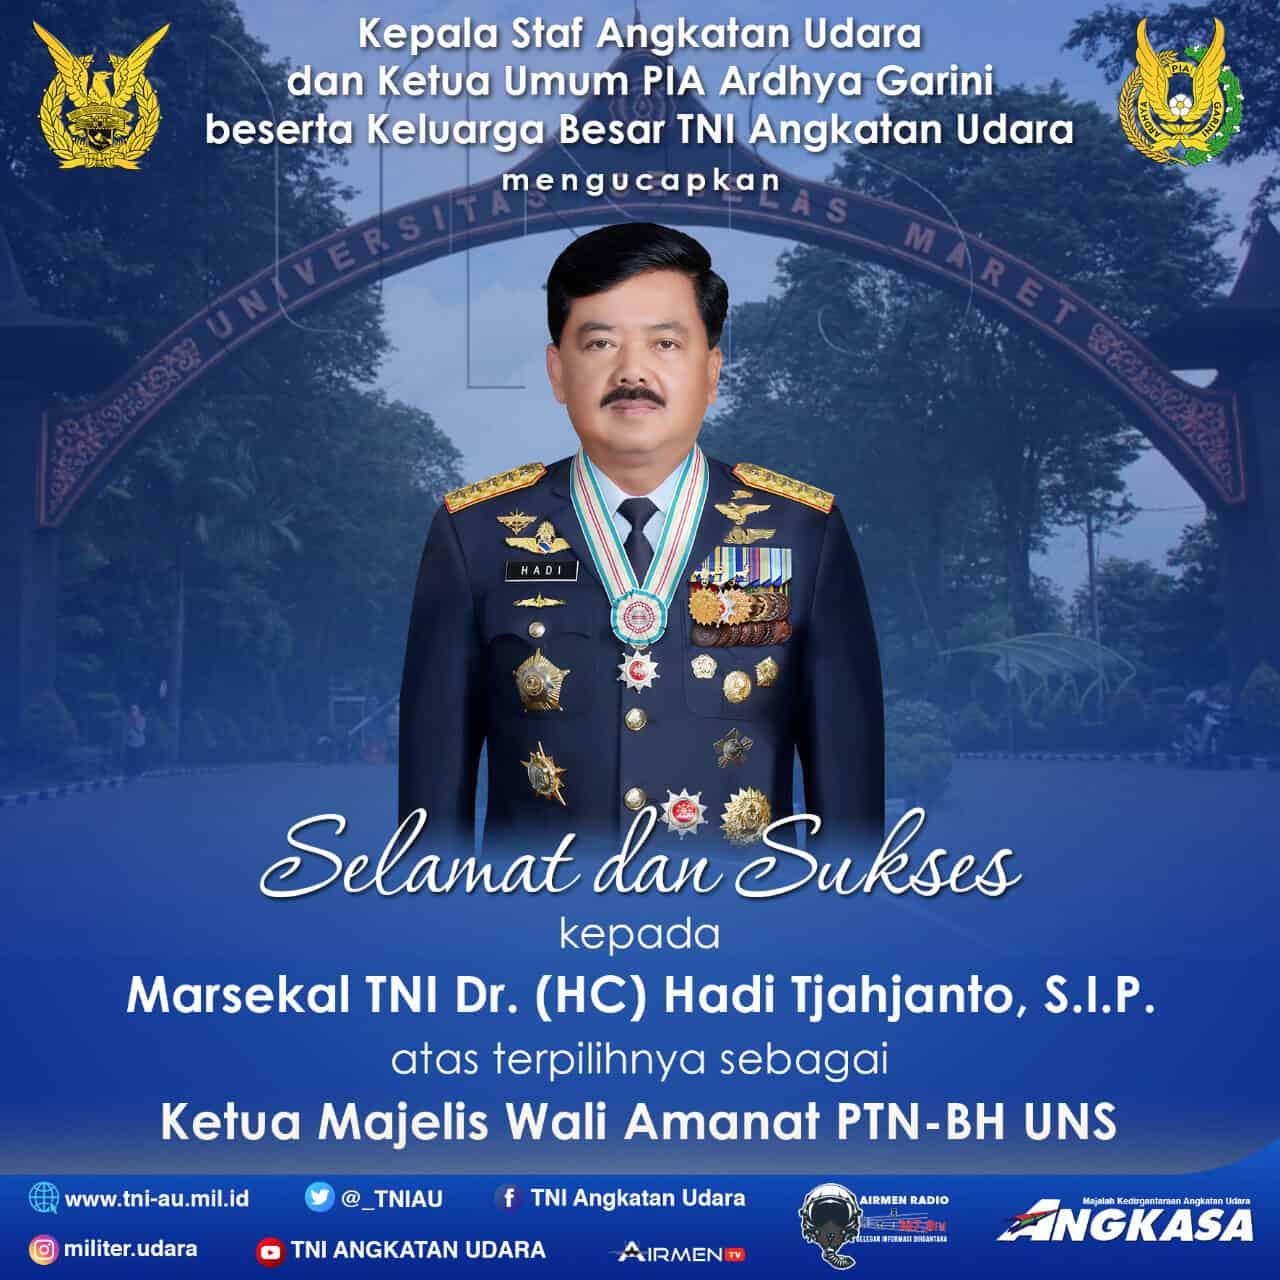 SELAMAT UNTUK MARSEKAL TNI DR. (H.C.) HADI TJAHJANTO, S.I.P.